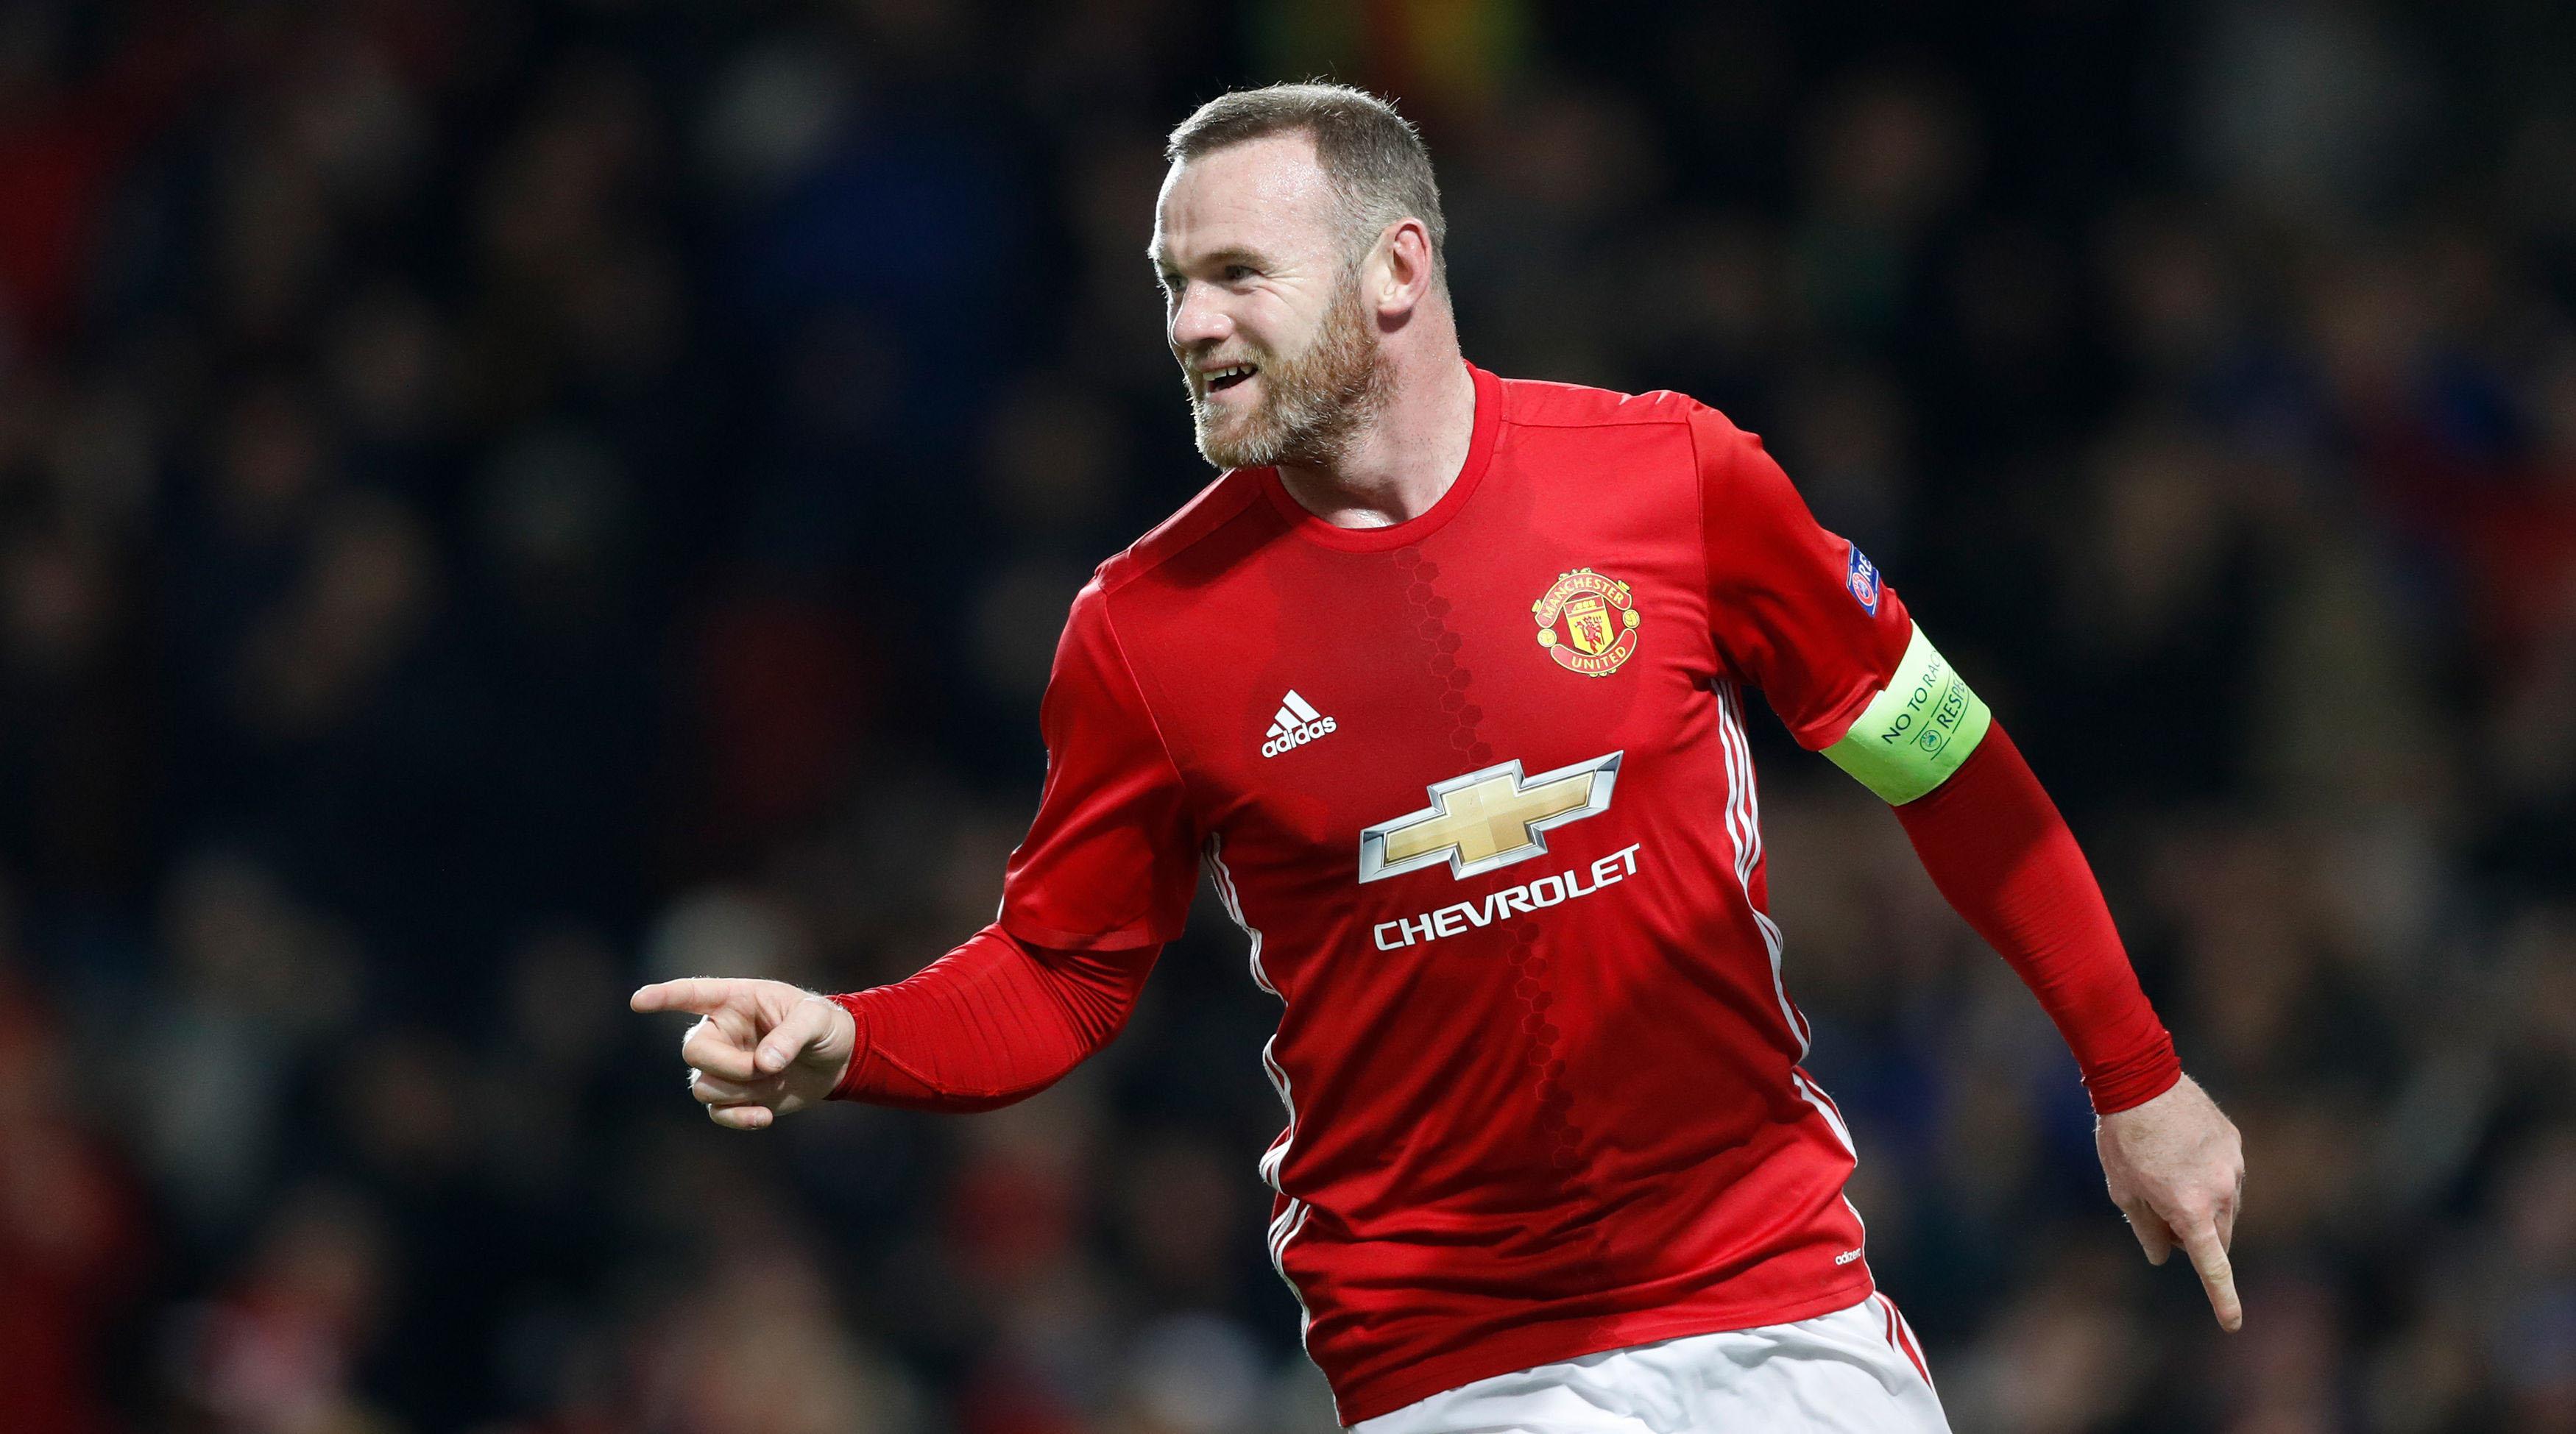 Wayne Rooney will start for Manchester United against Reading.